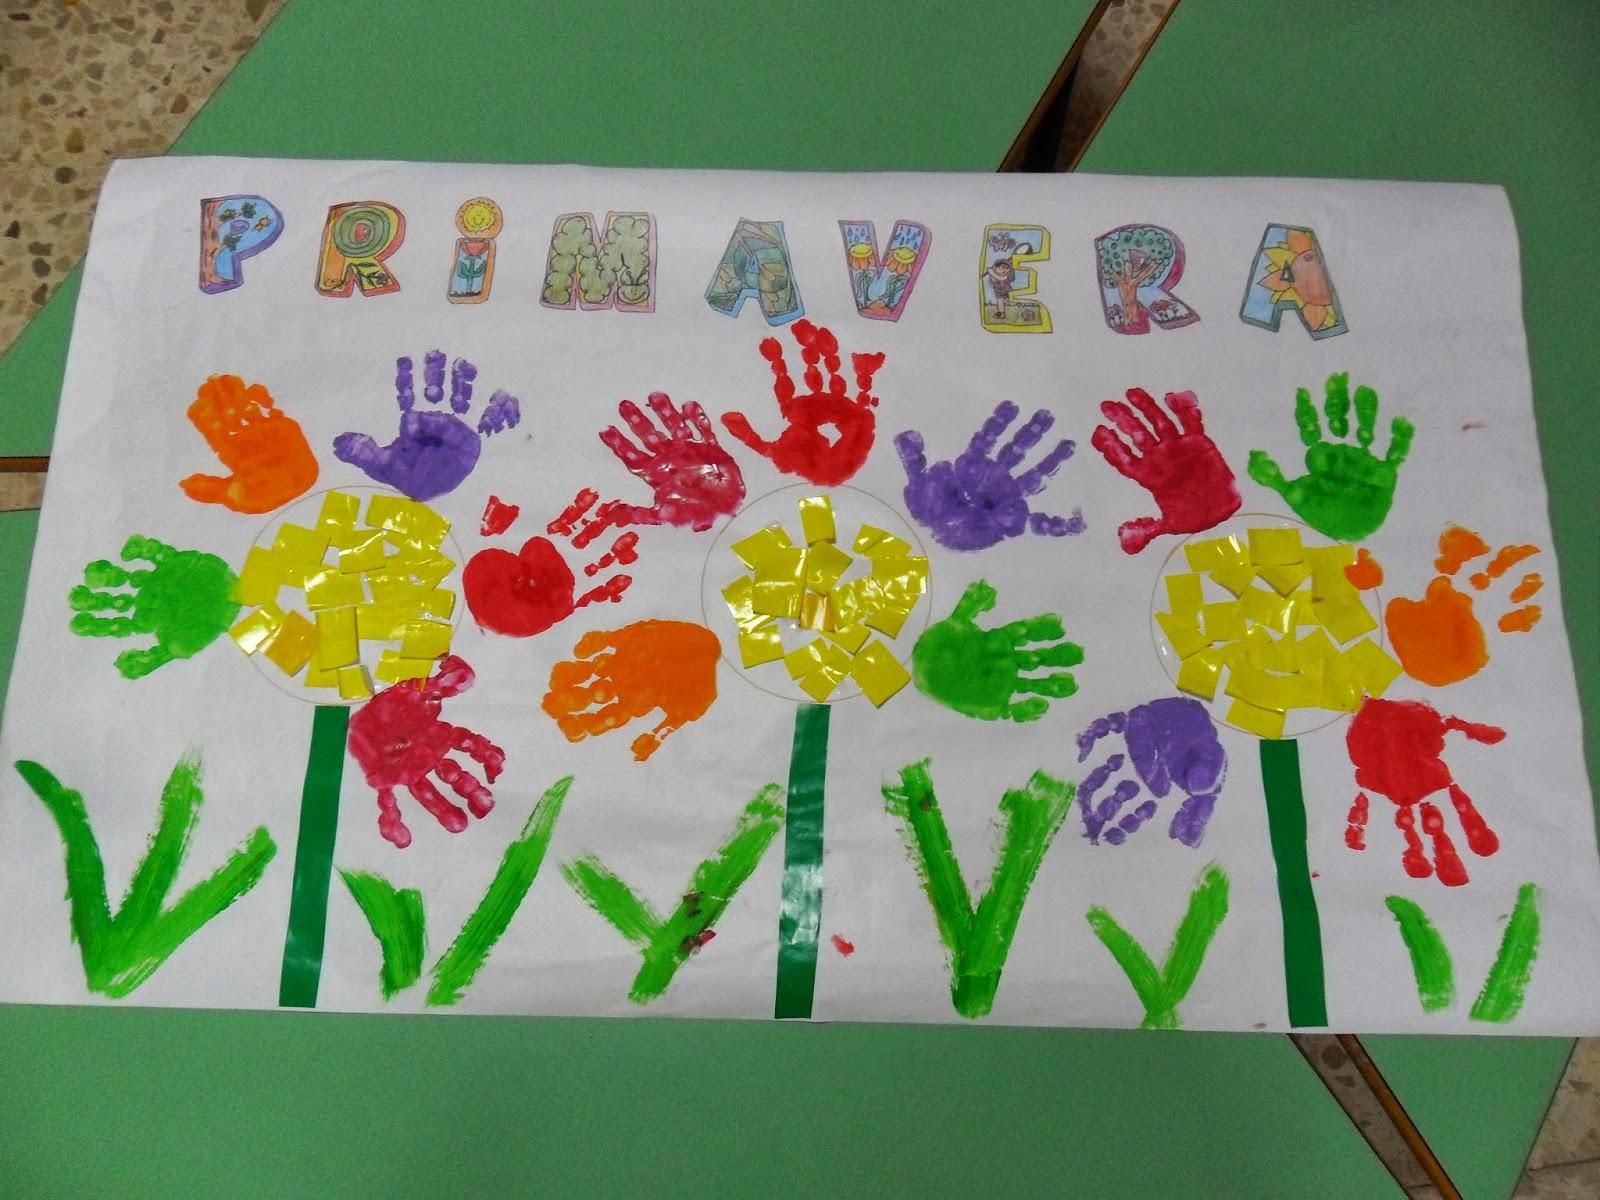 Materiales para educaci n infantil la primavera ha venido for Mural de fotos en cartulina